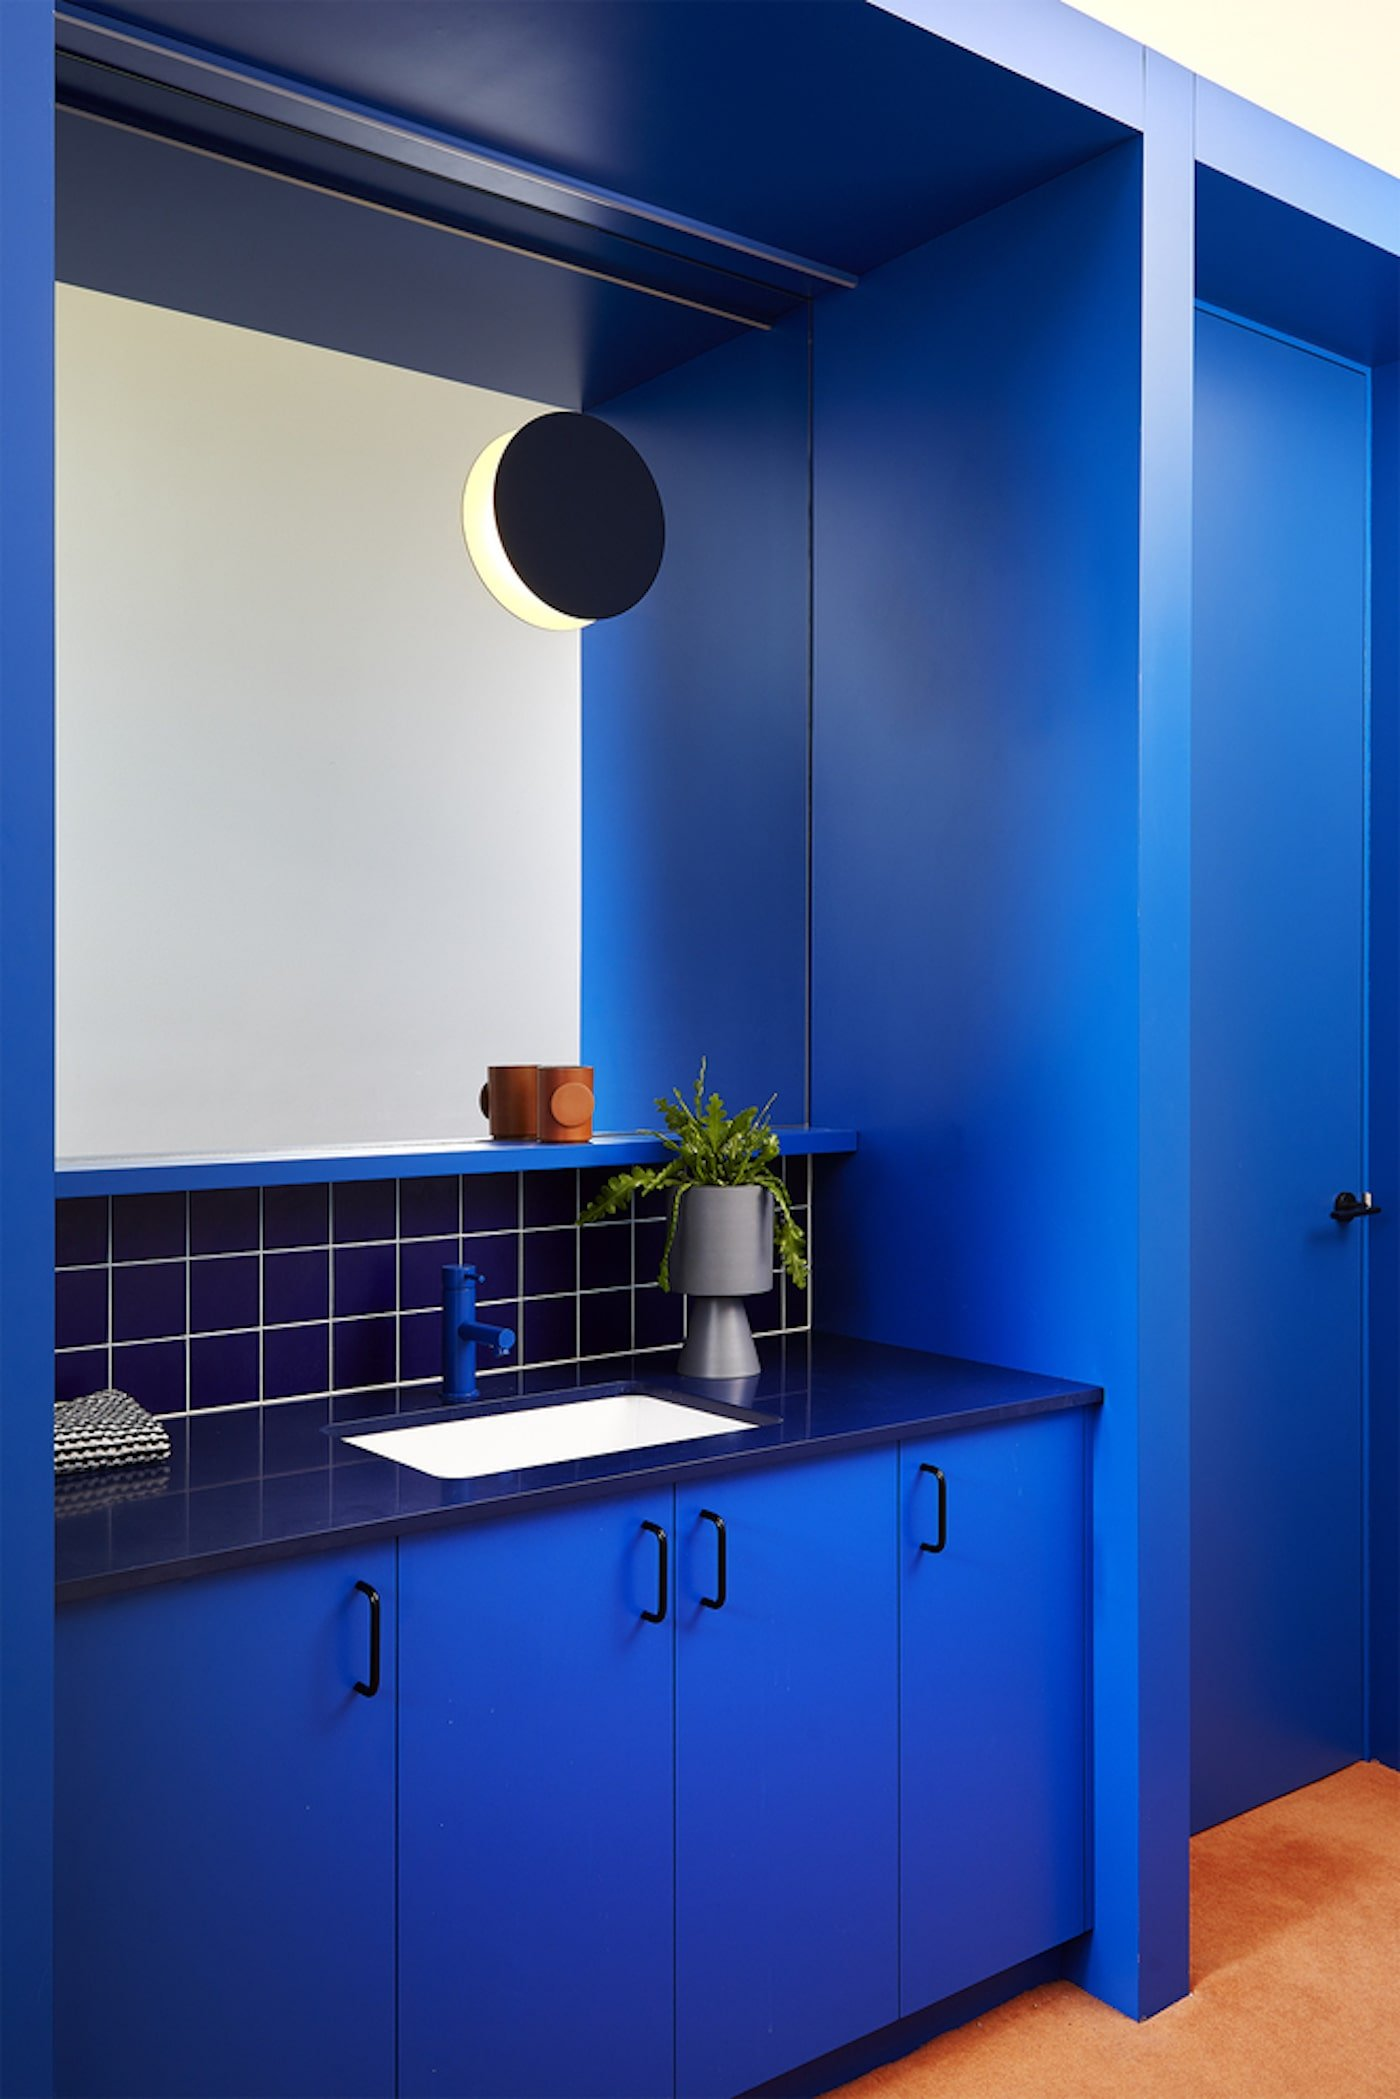 Eco Edition_MRTN Architects_Good Life House_Architecture interiors 25-min